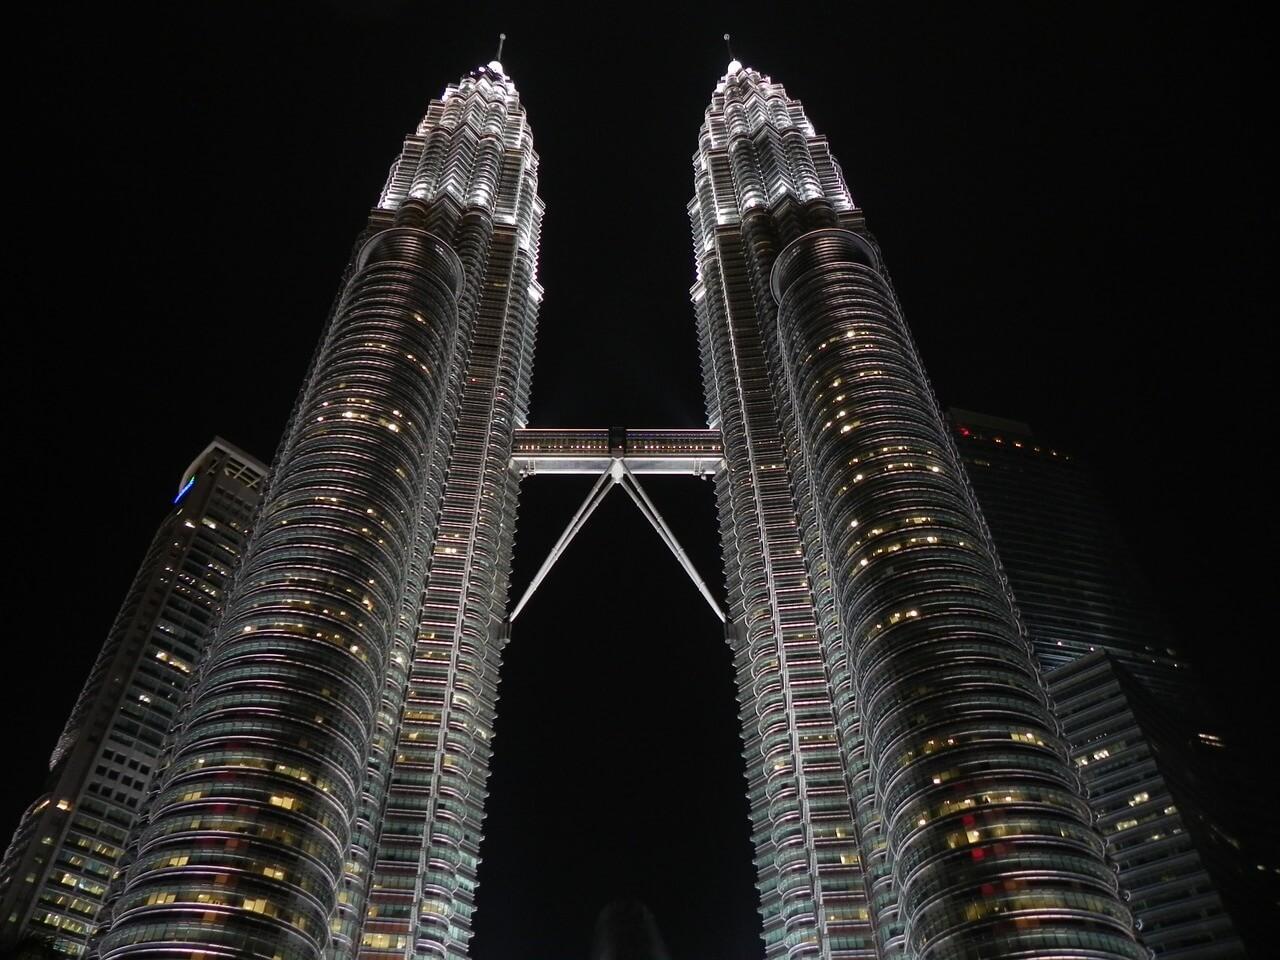 Types of Travel Writing - Malaysia